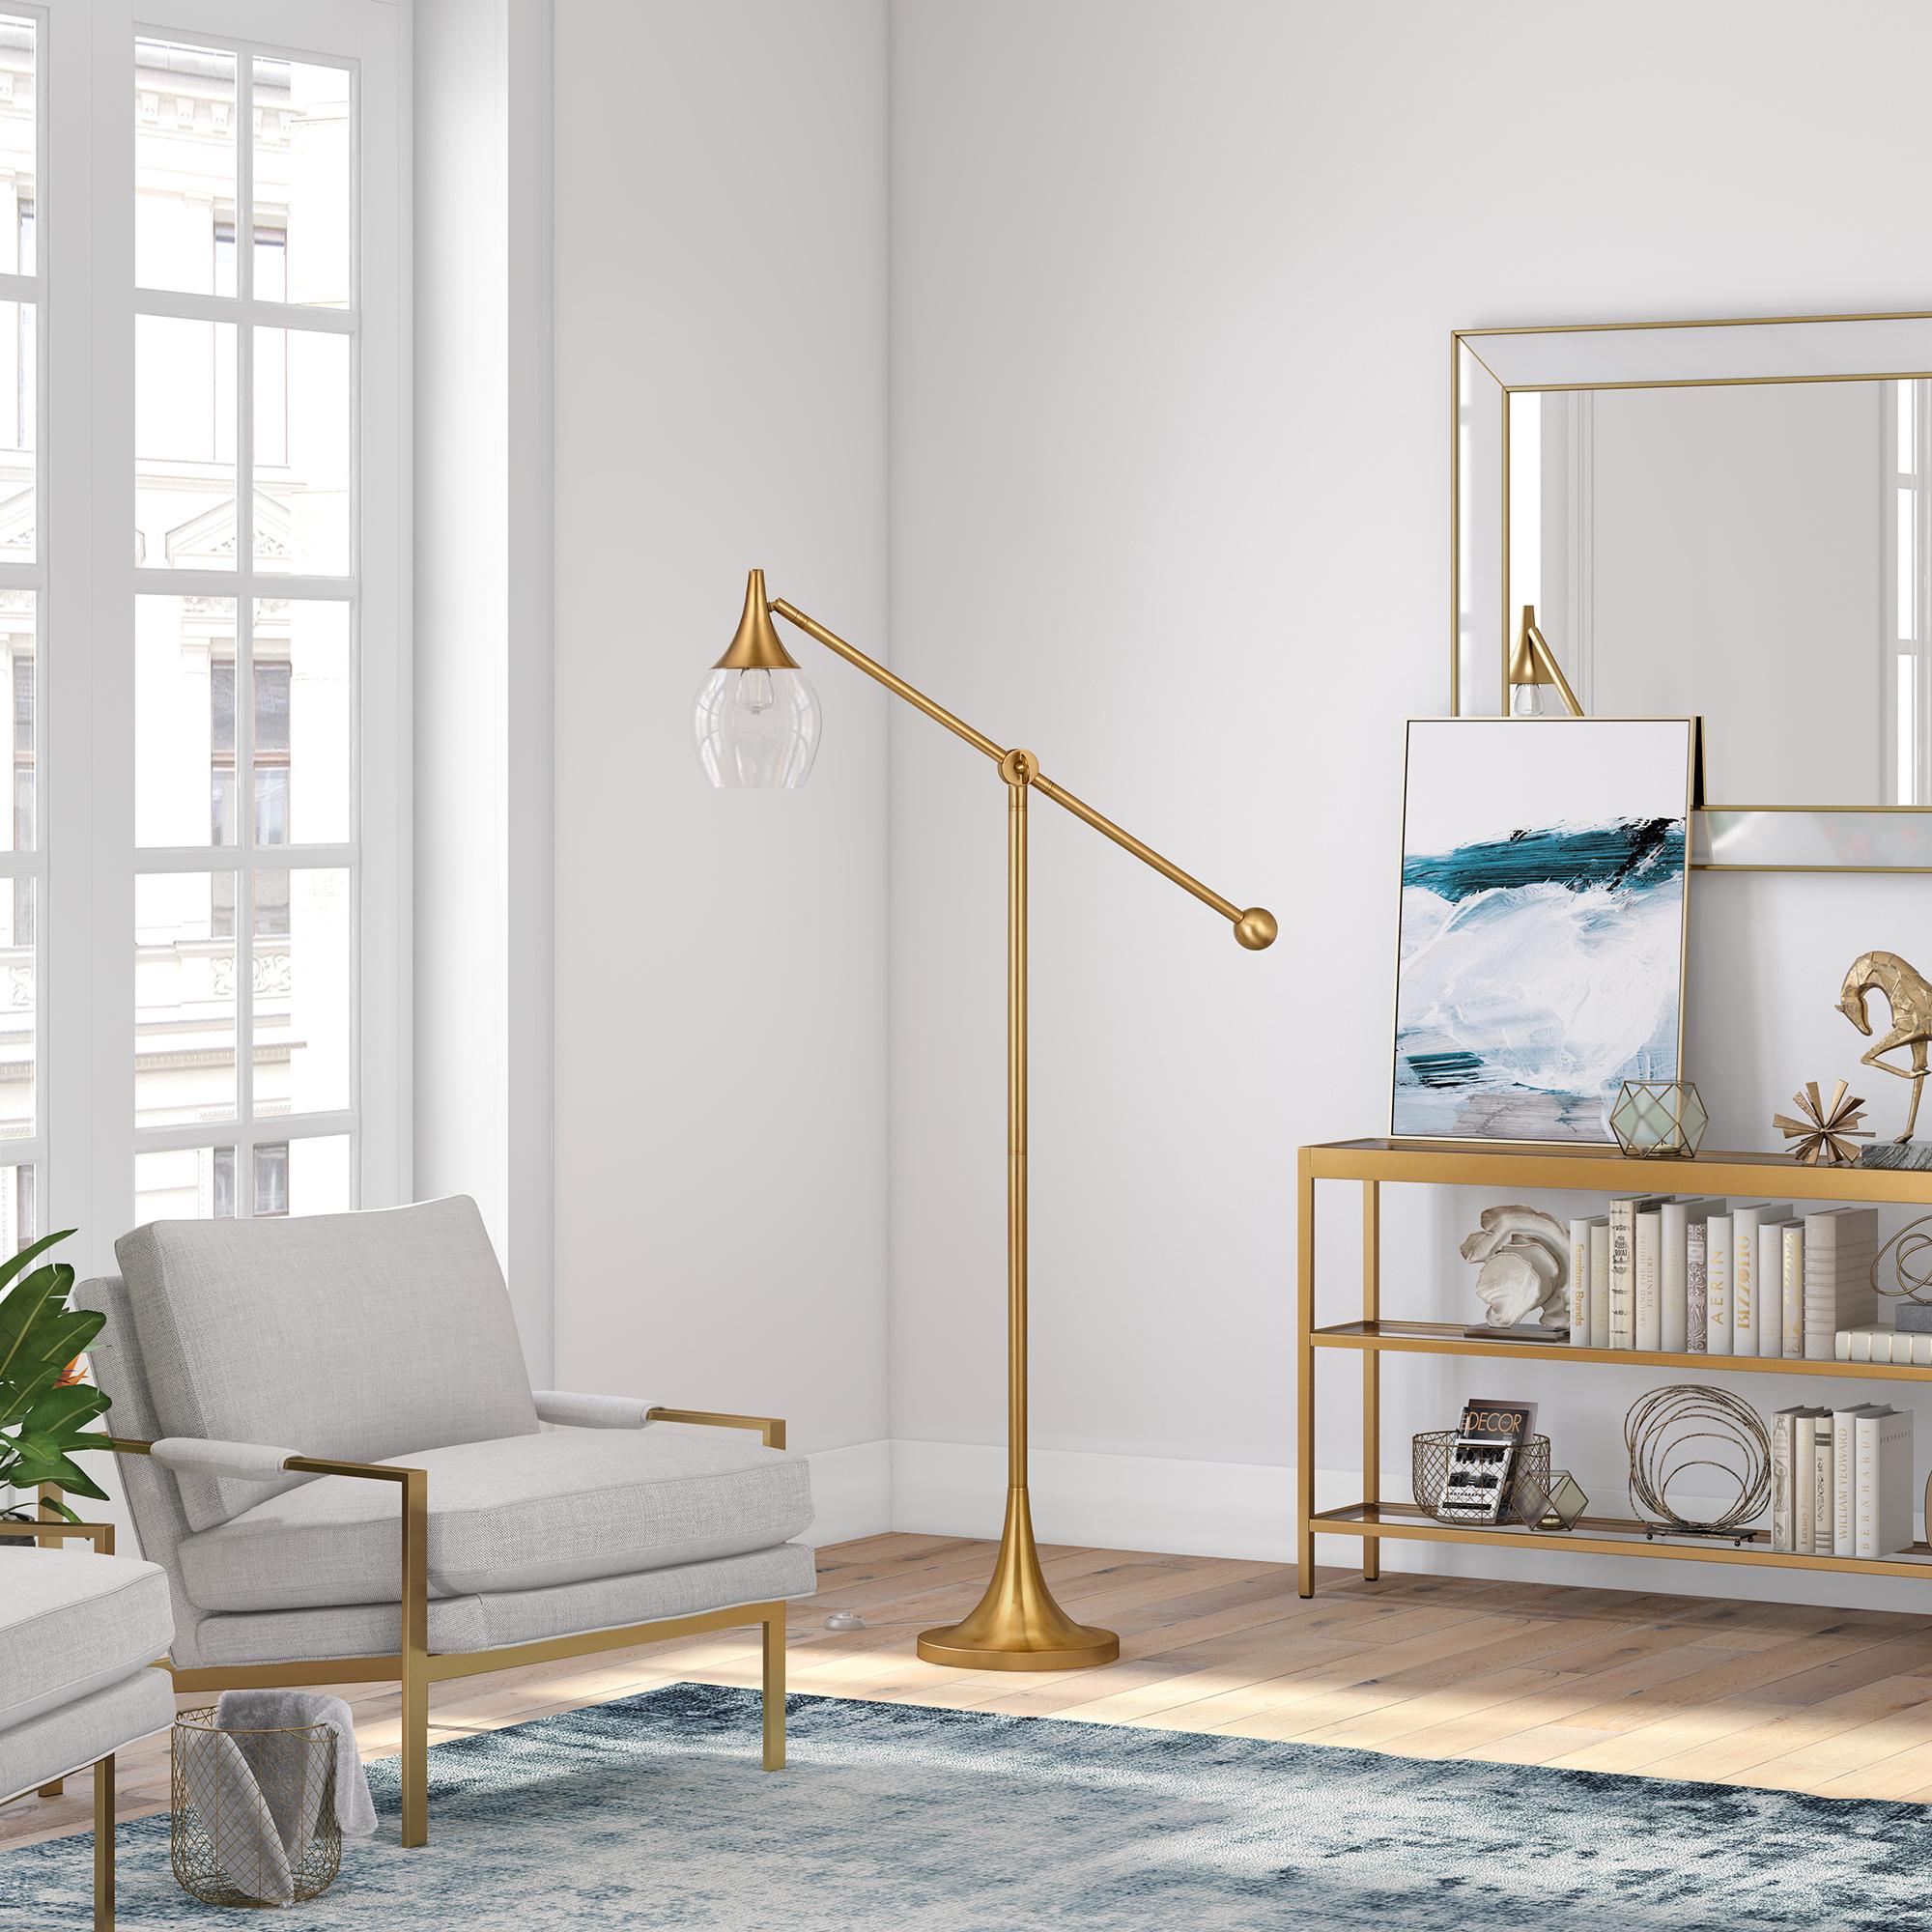 Granger Brass Floor Lamp with Boom Arm